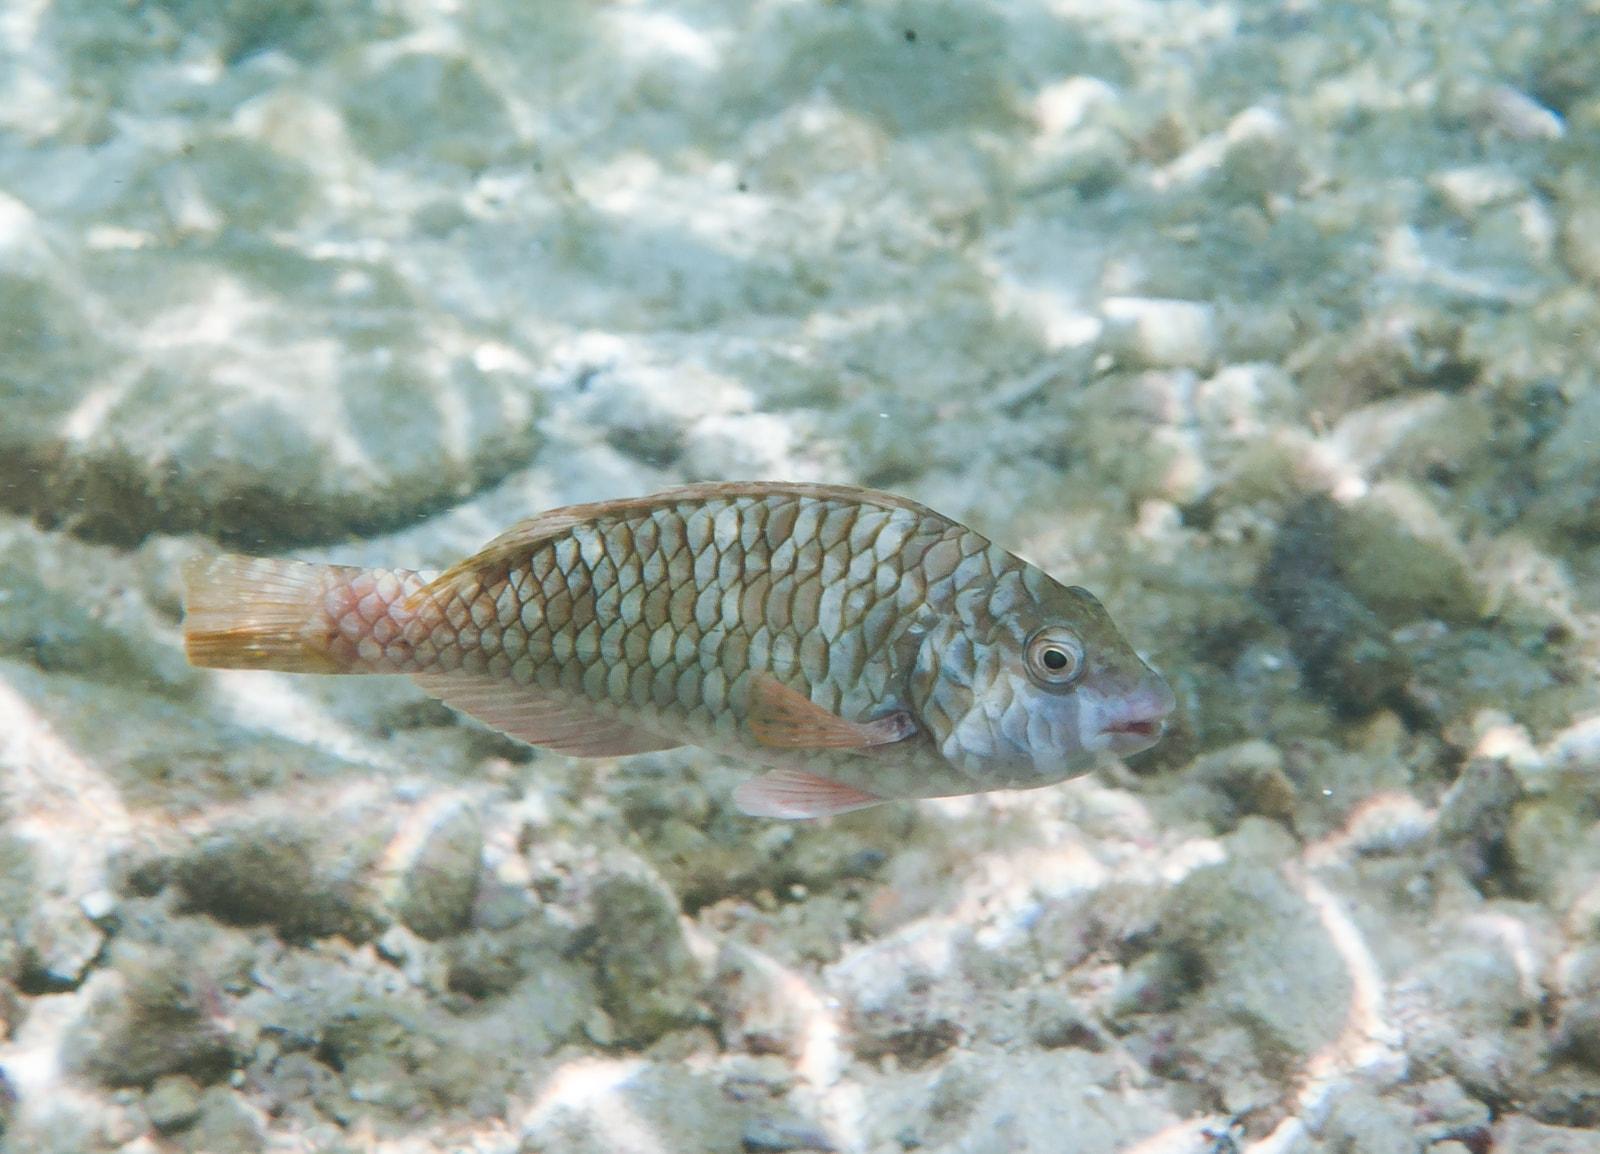 Yellowtail Parrotfish (Sparisoma rubripinne)